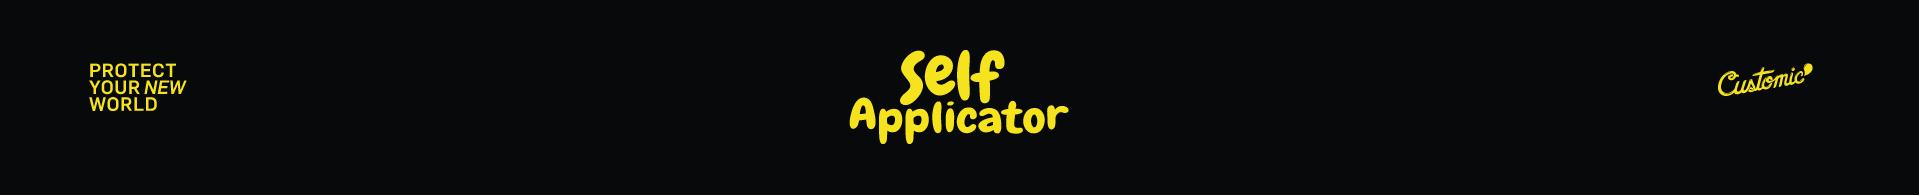 Película Self Applicator.